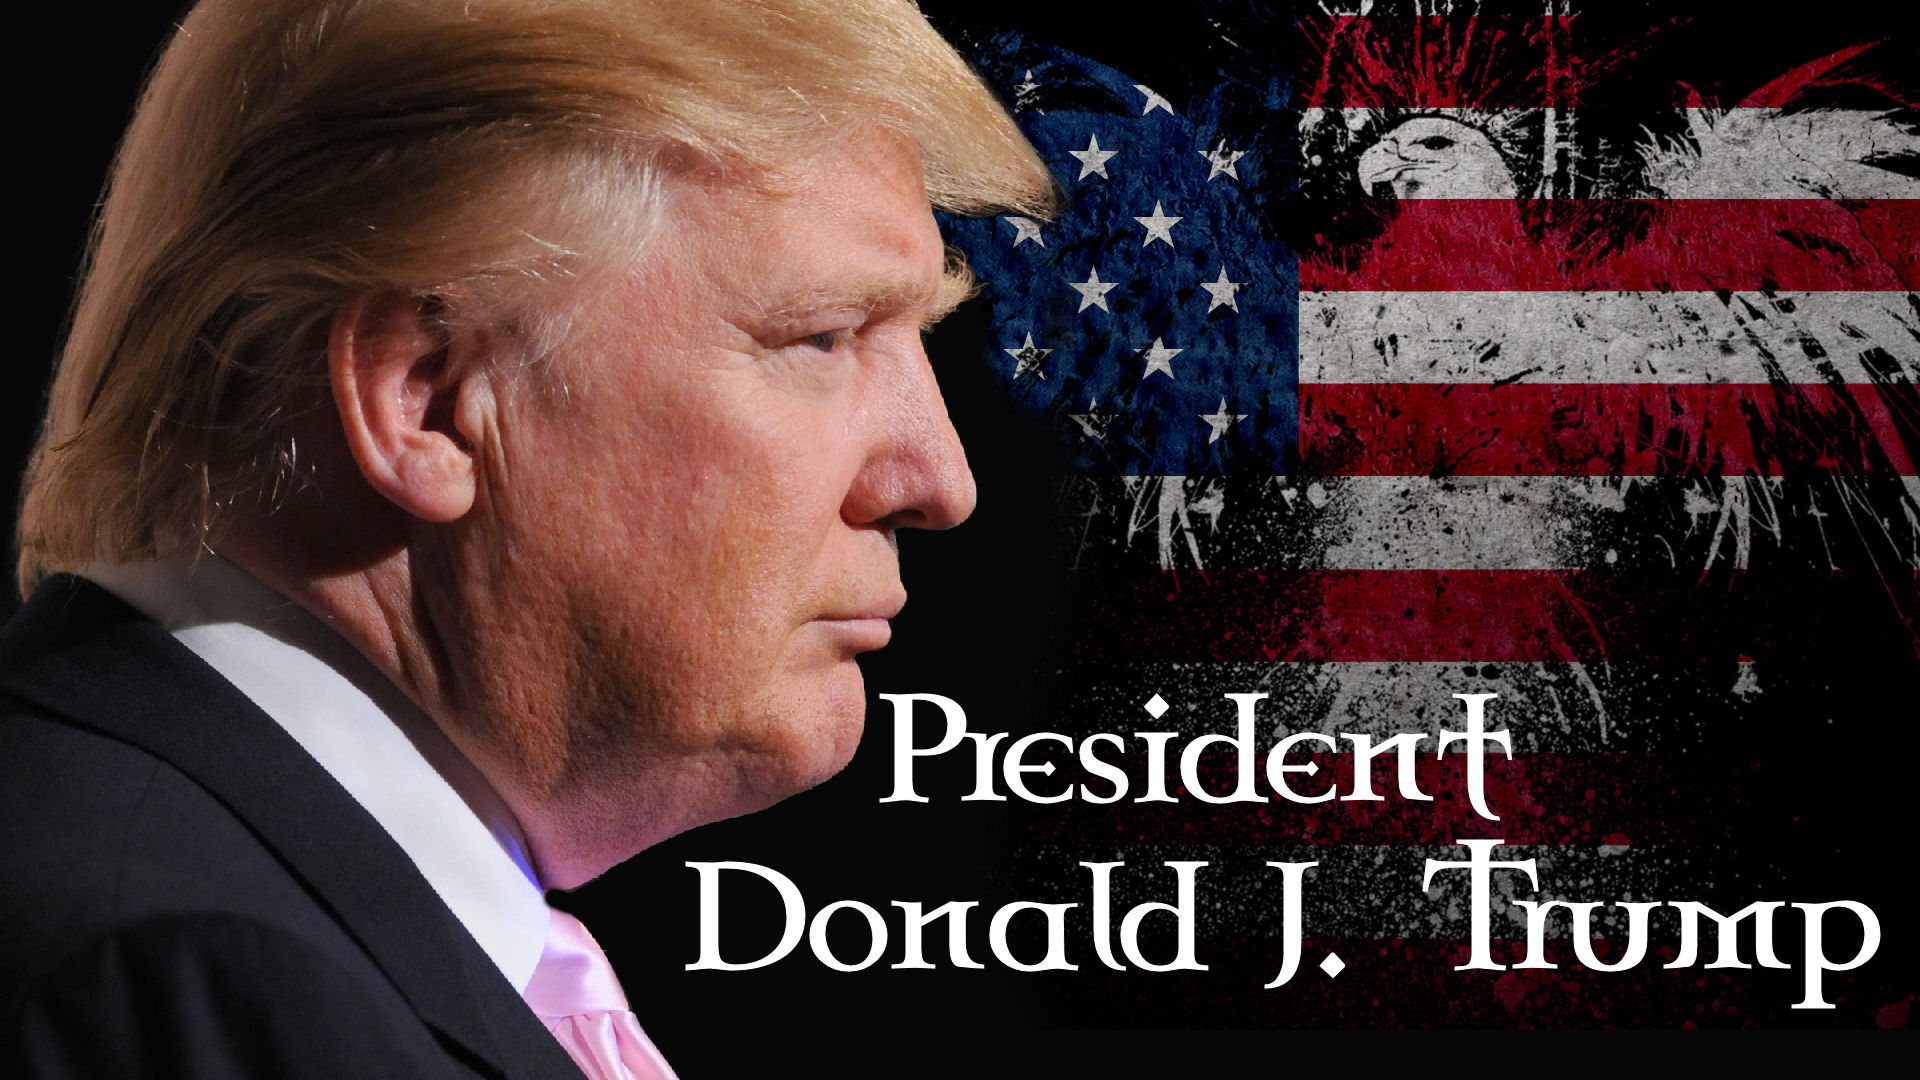 Donald Trump Images President Donald J Trump Hd Wallpaper And